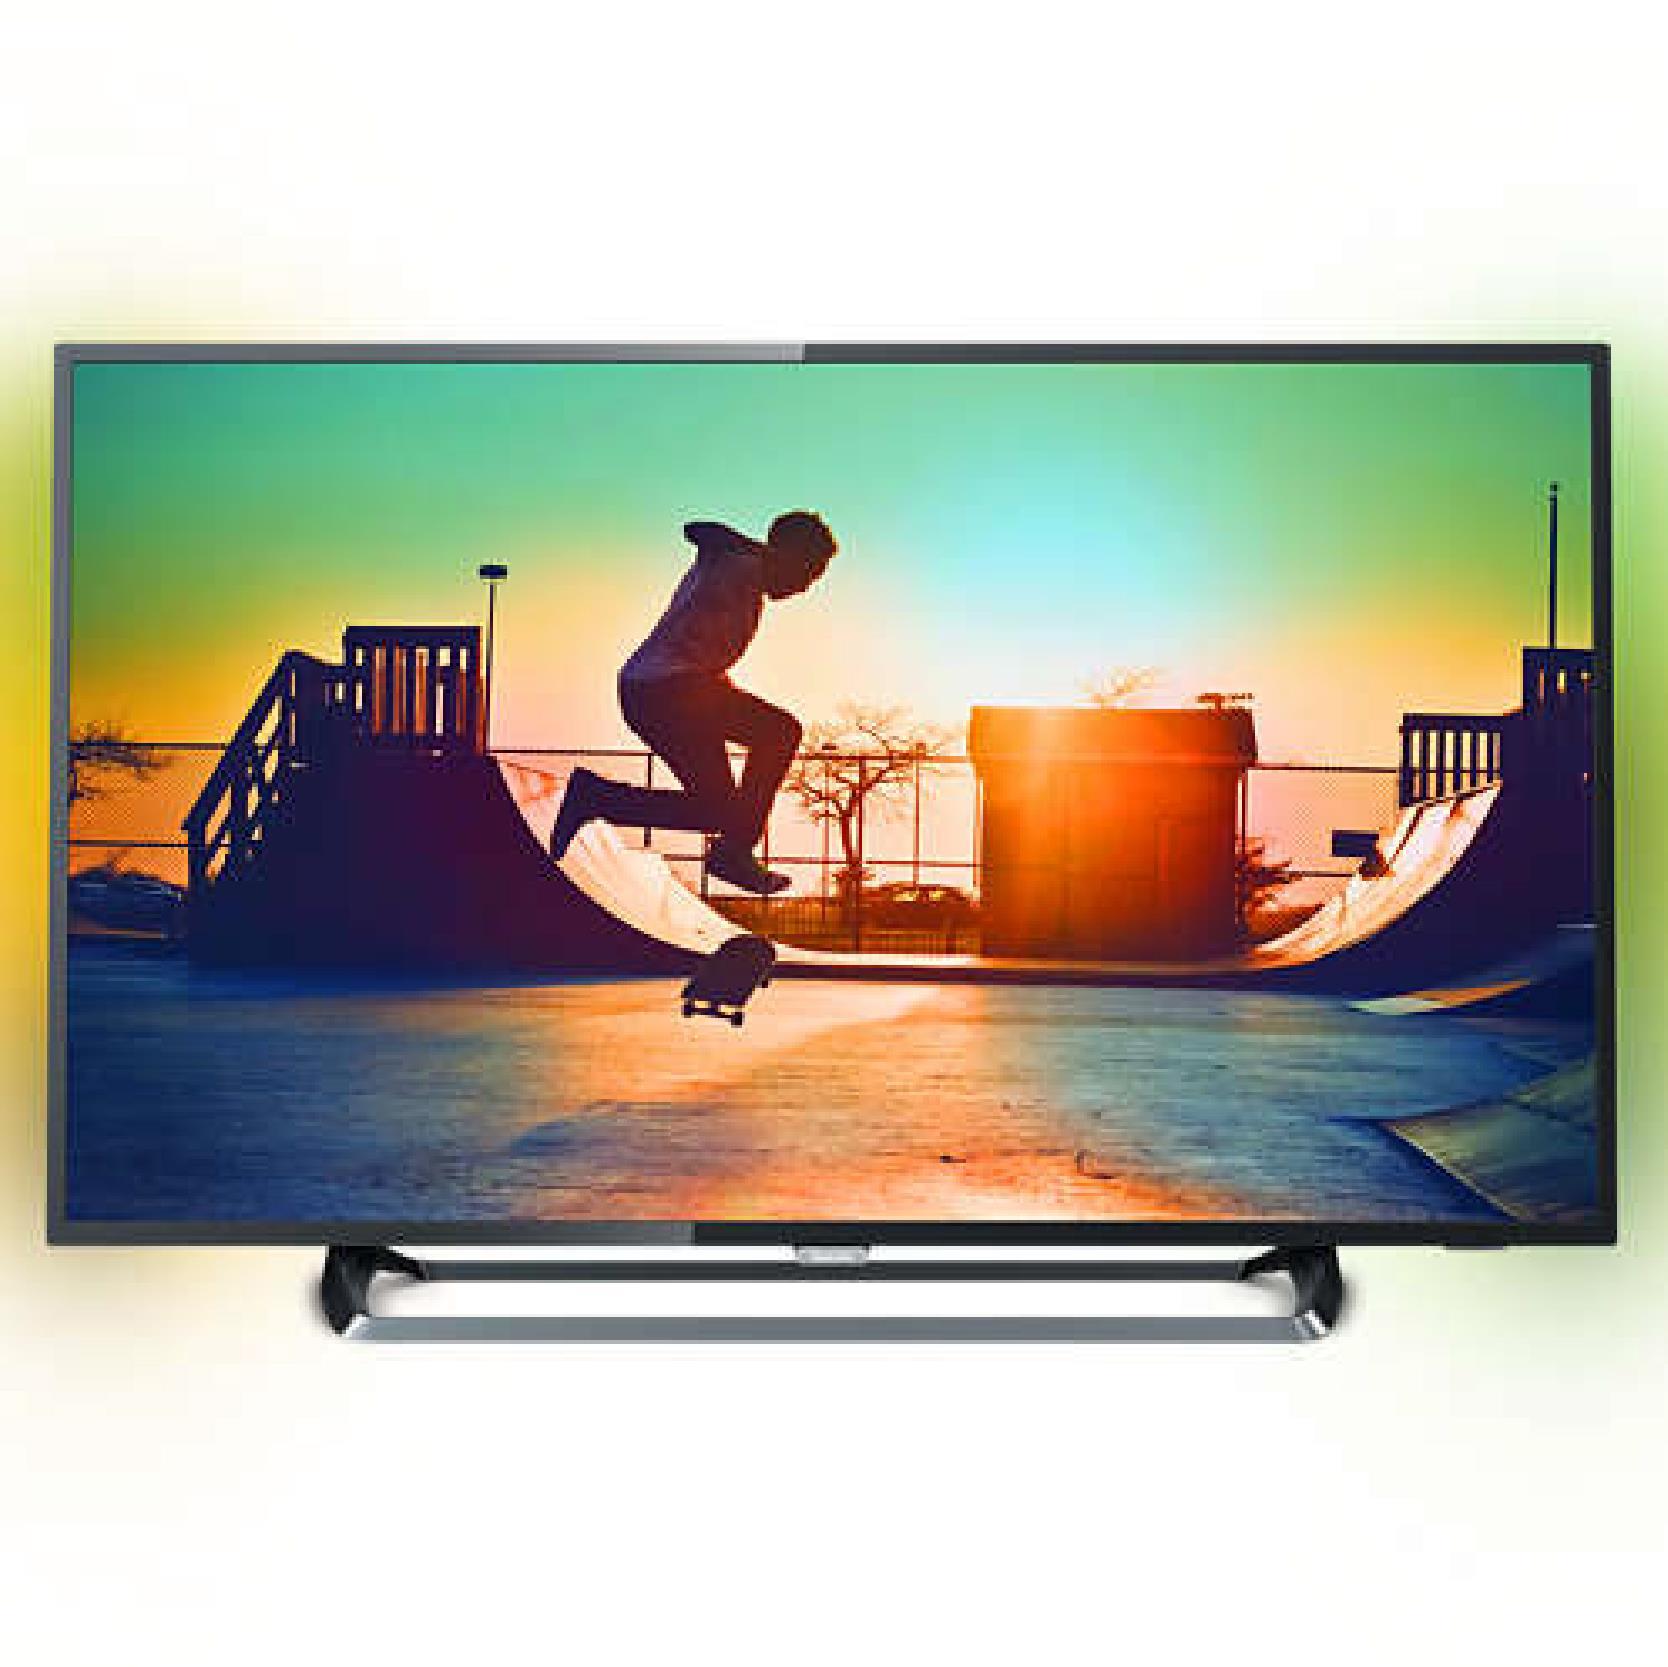 "Philips 6000 series 4K Ultra Slim Smart LED TV 43PUS6262 108 cm (43"") 4K Ultra HD Quad Core DVB T/C/T2/T2-HD/S/S2 Ambilight 2-sided Pixel Plus"